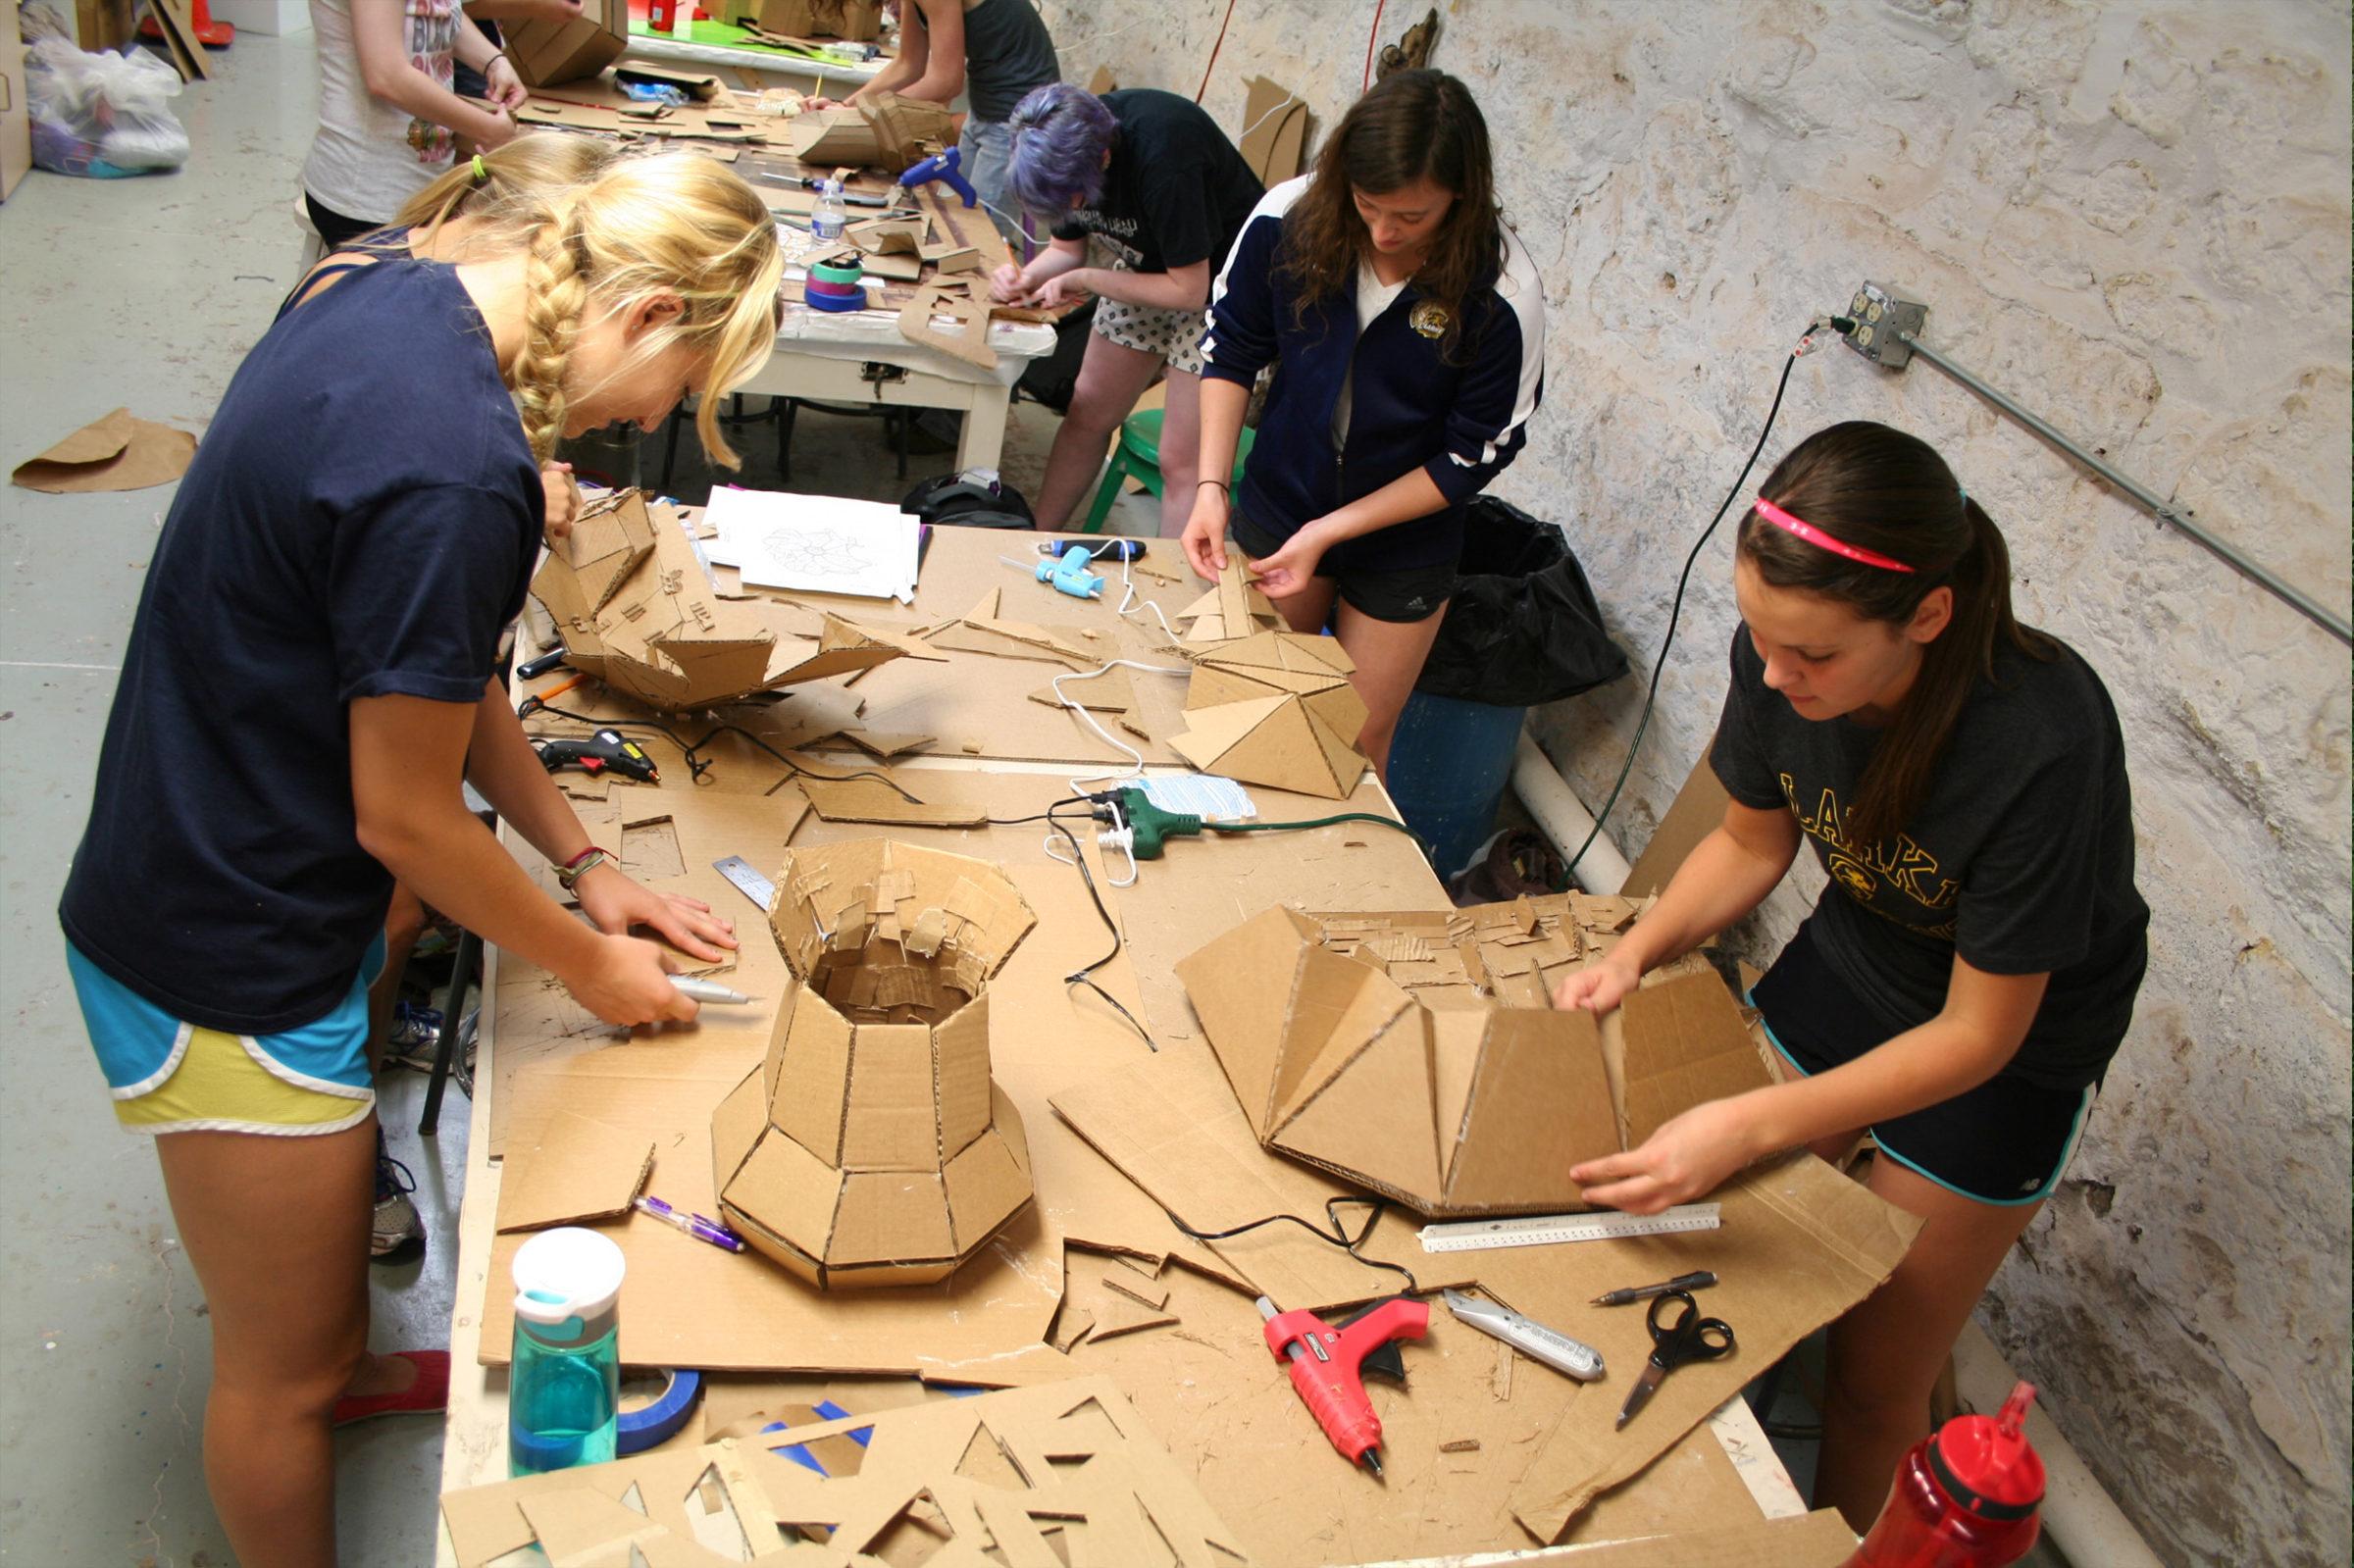 Clarke University Art students in studio on campus.